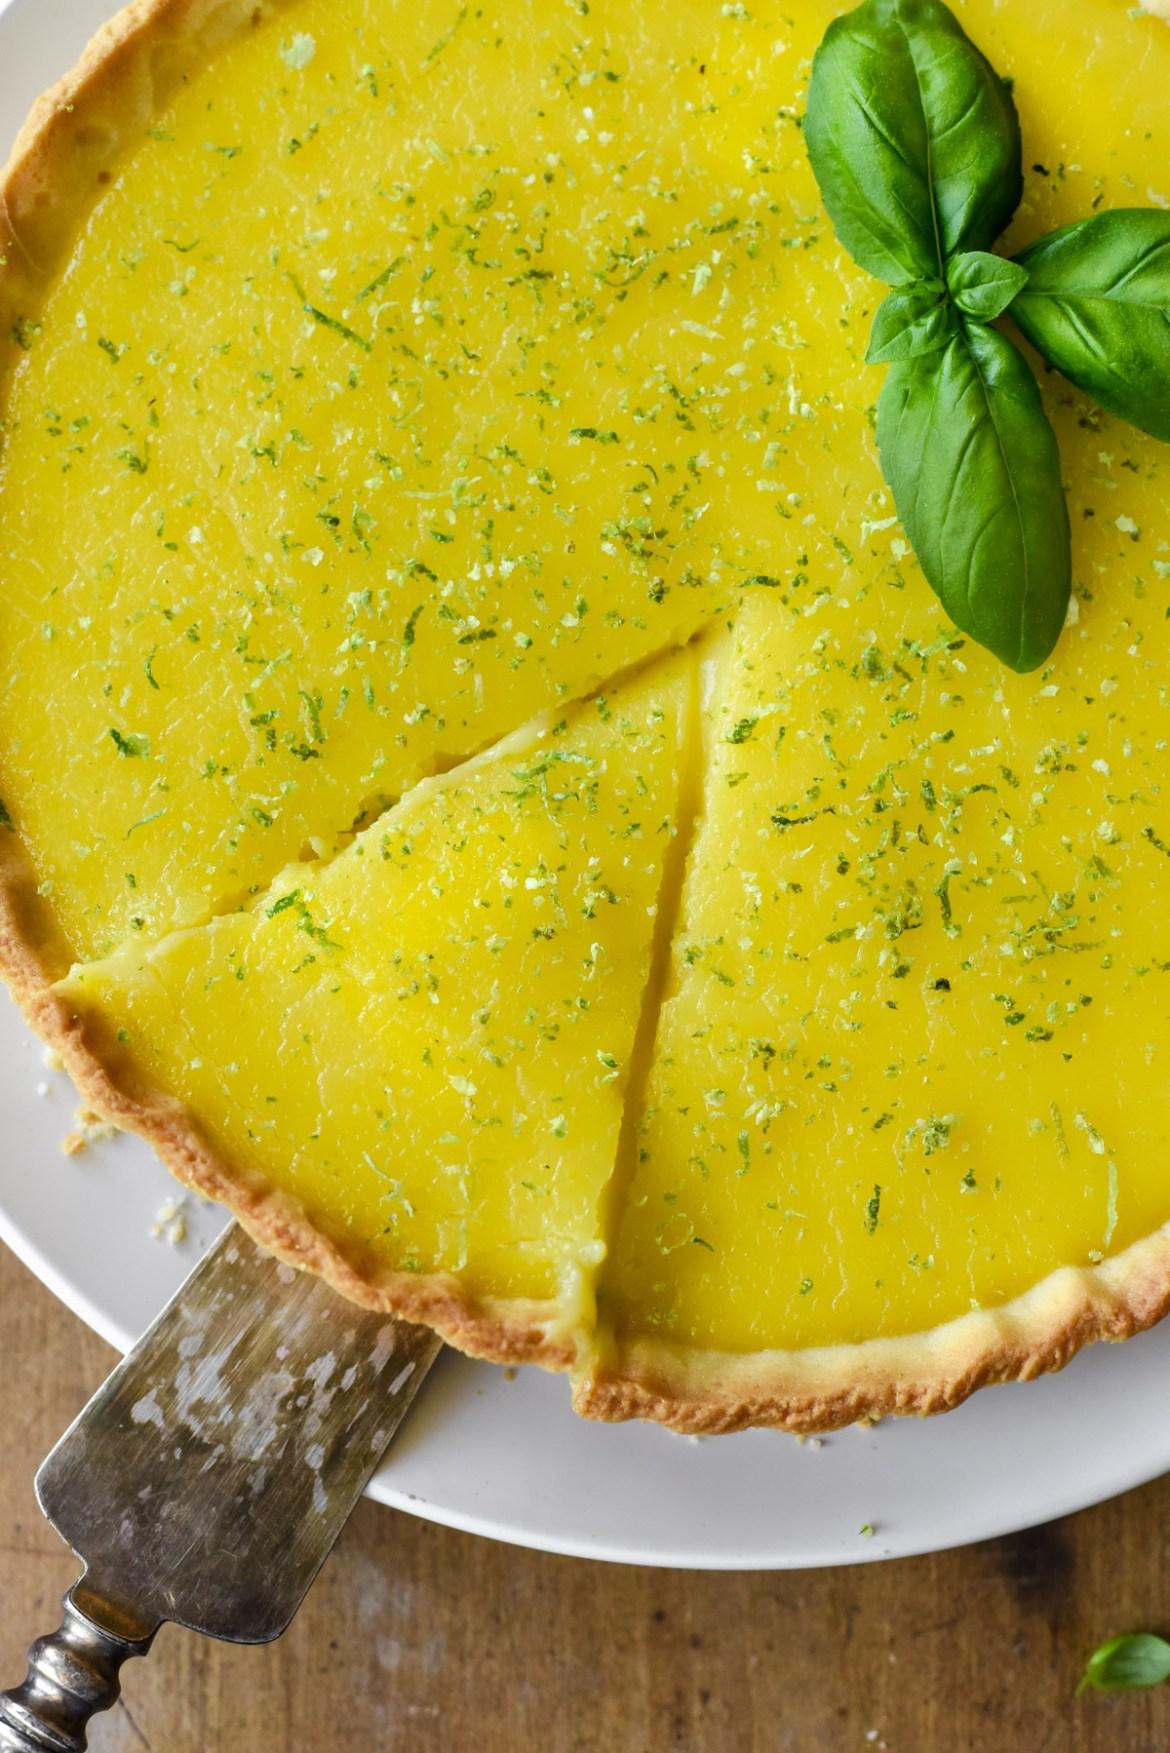 Lemon-Lime Basil Tart